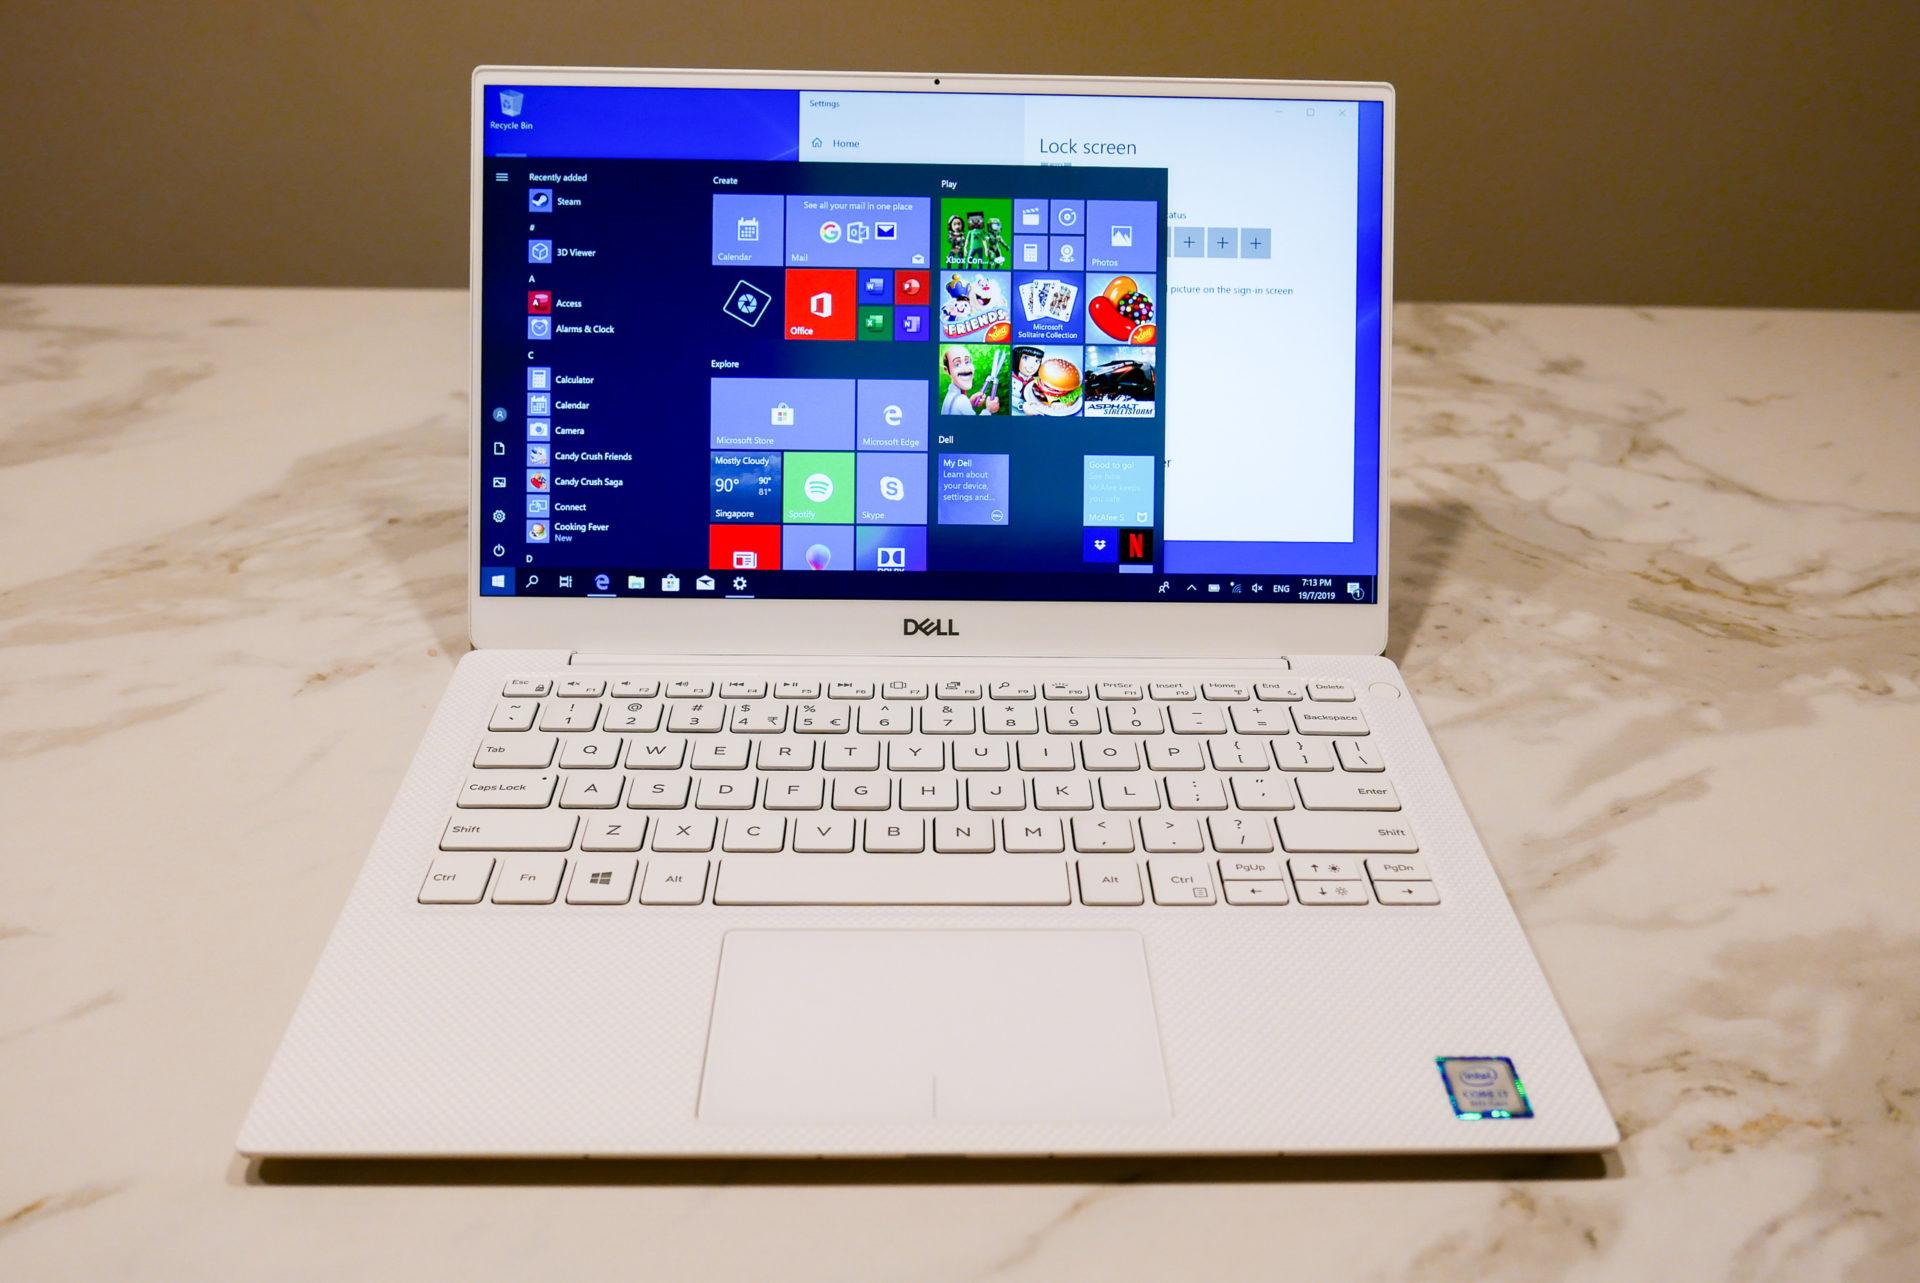 Goondu review: Dell XPS 13 (9380) gets front camera right